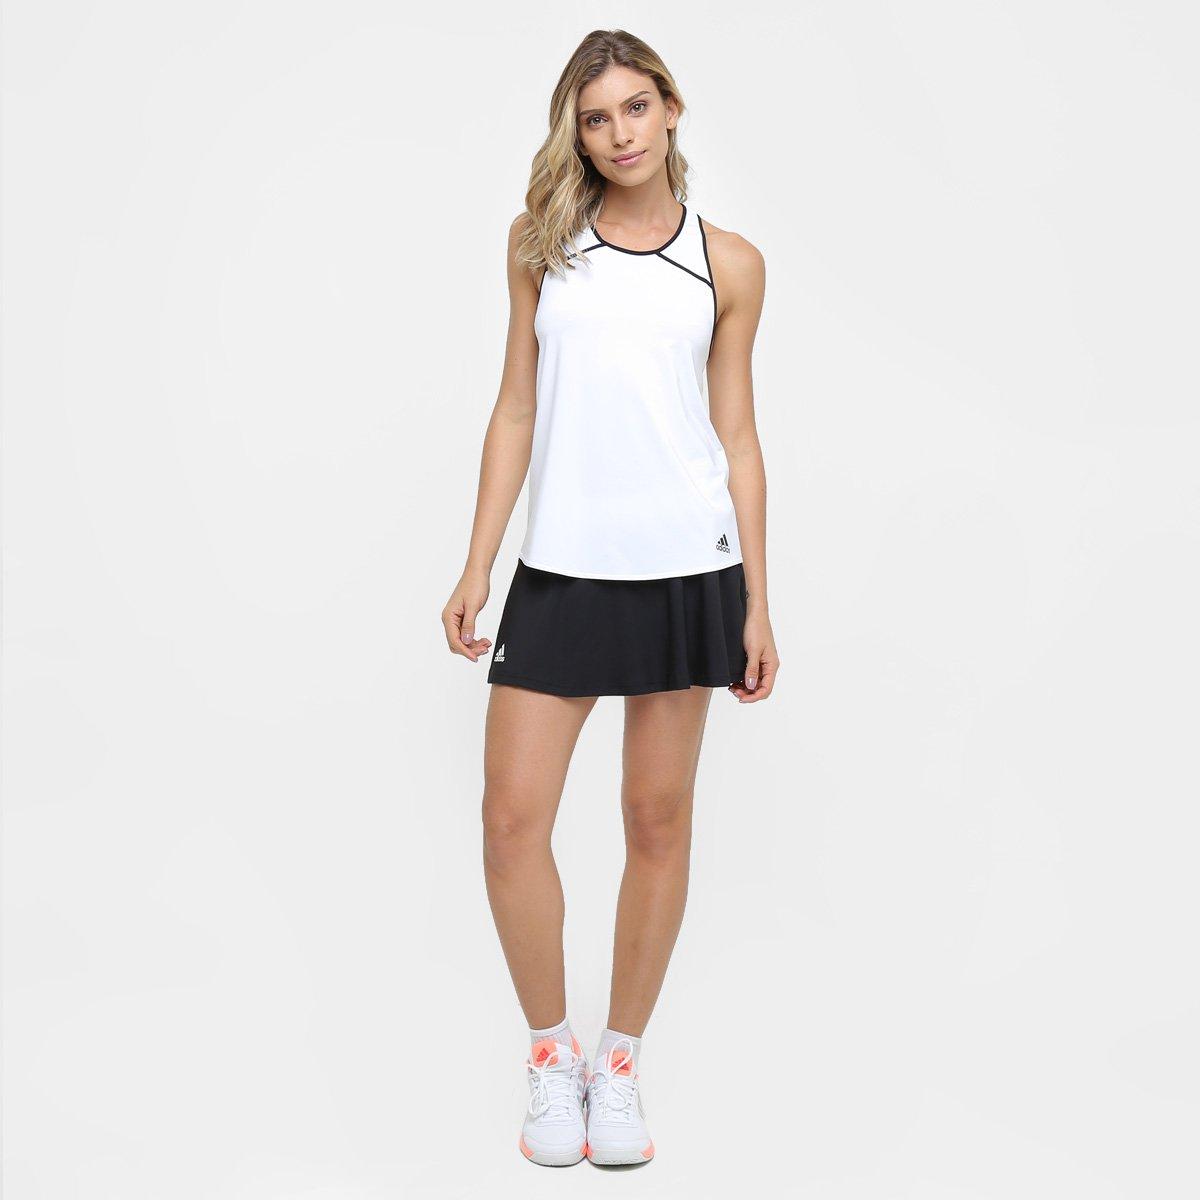 e W Preto Camiseta Regata Club Branco Adidas Camiseta Regata HzRwq66